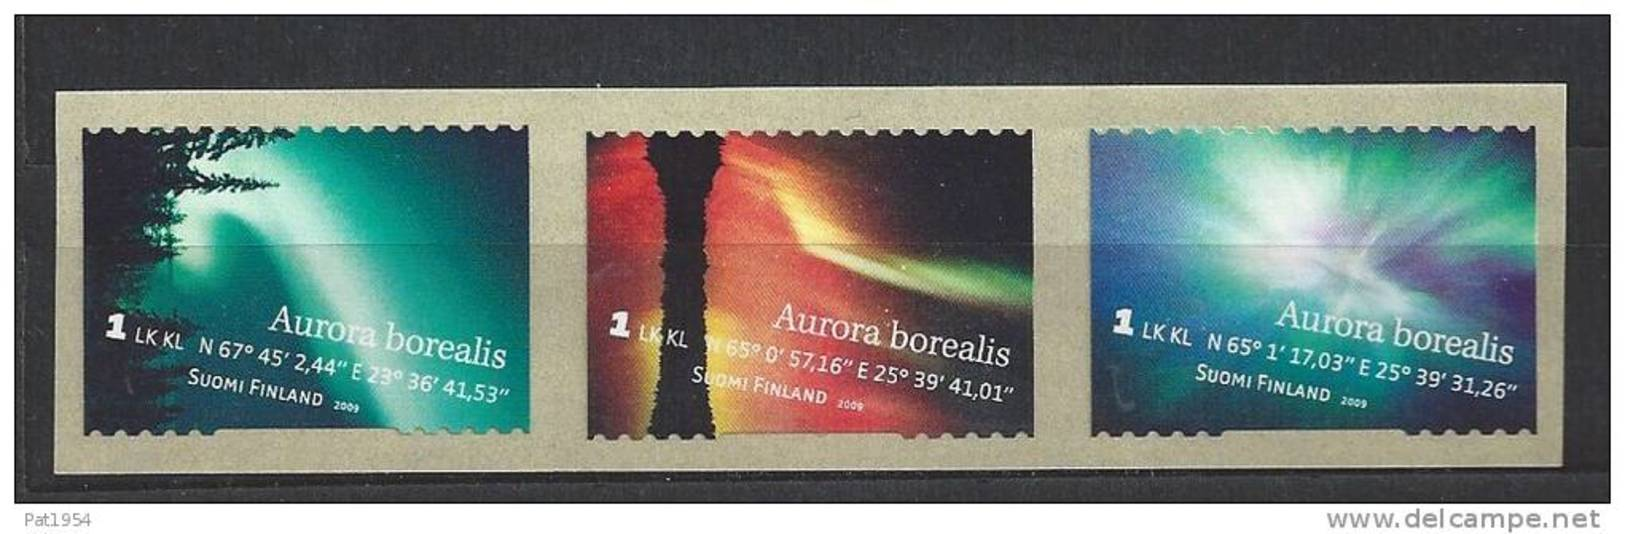 Finlande 2009 N°1959/1961 Neufs Aurores Boréales - Unused Stamps